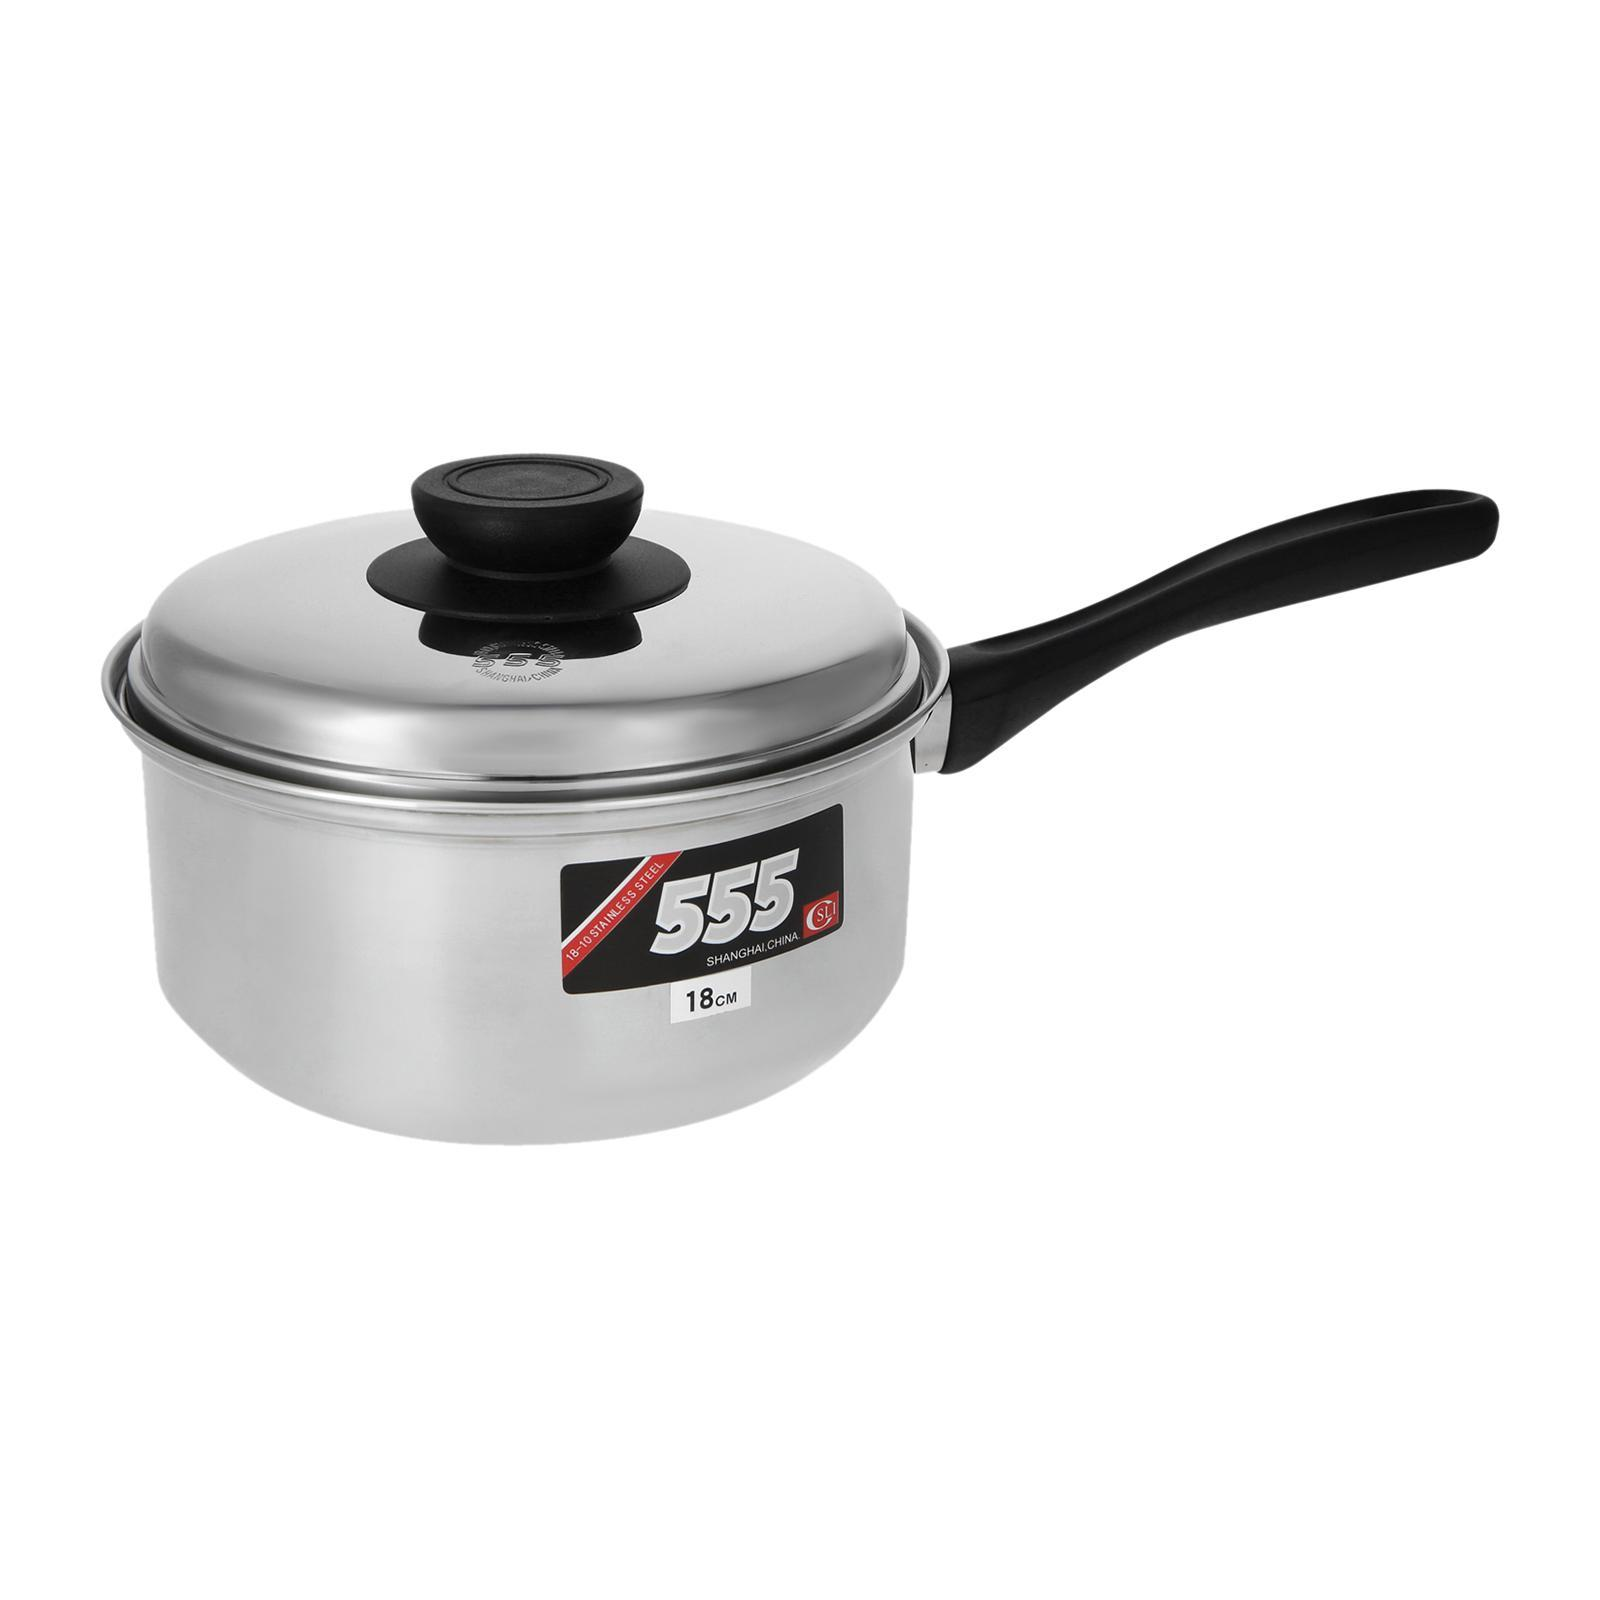 555 Classic Stainless Steel Saucepan 18 CM